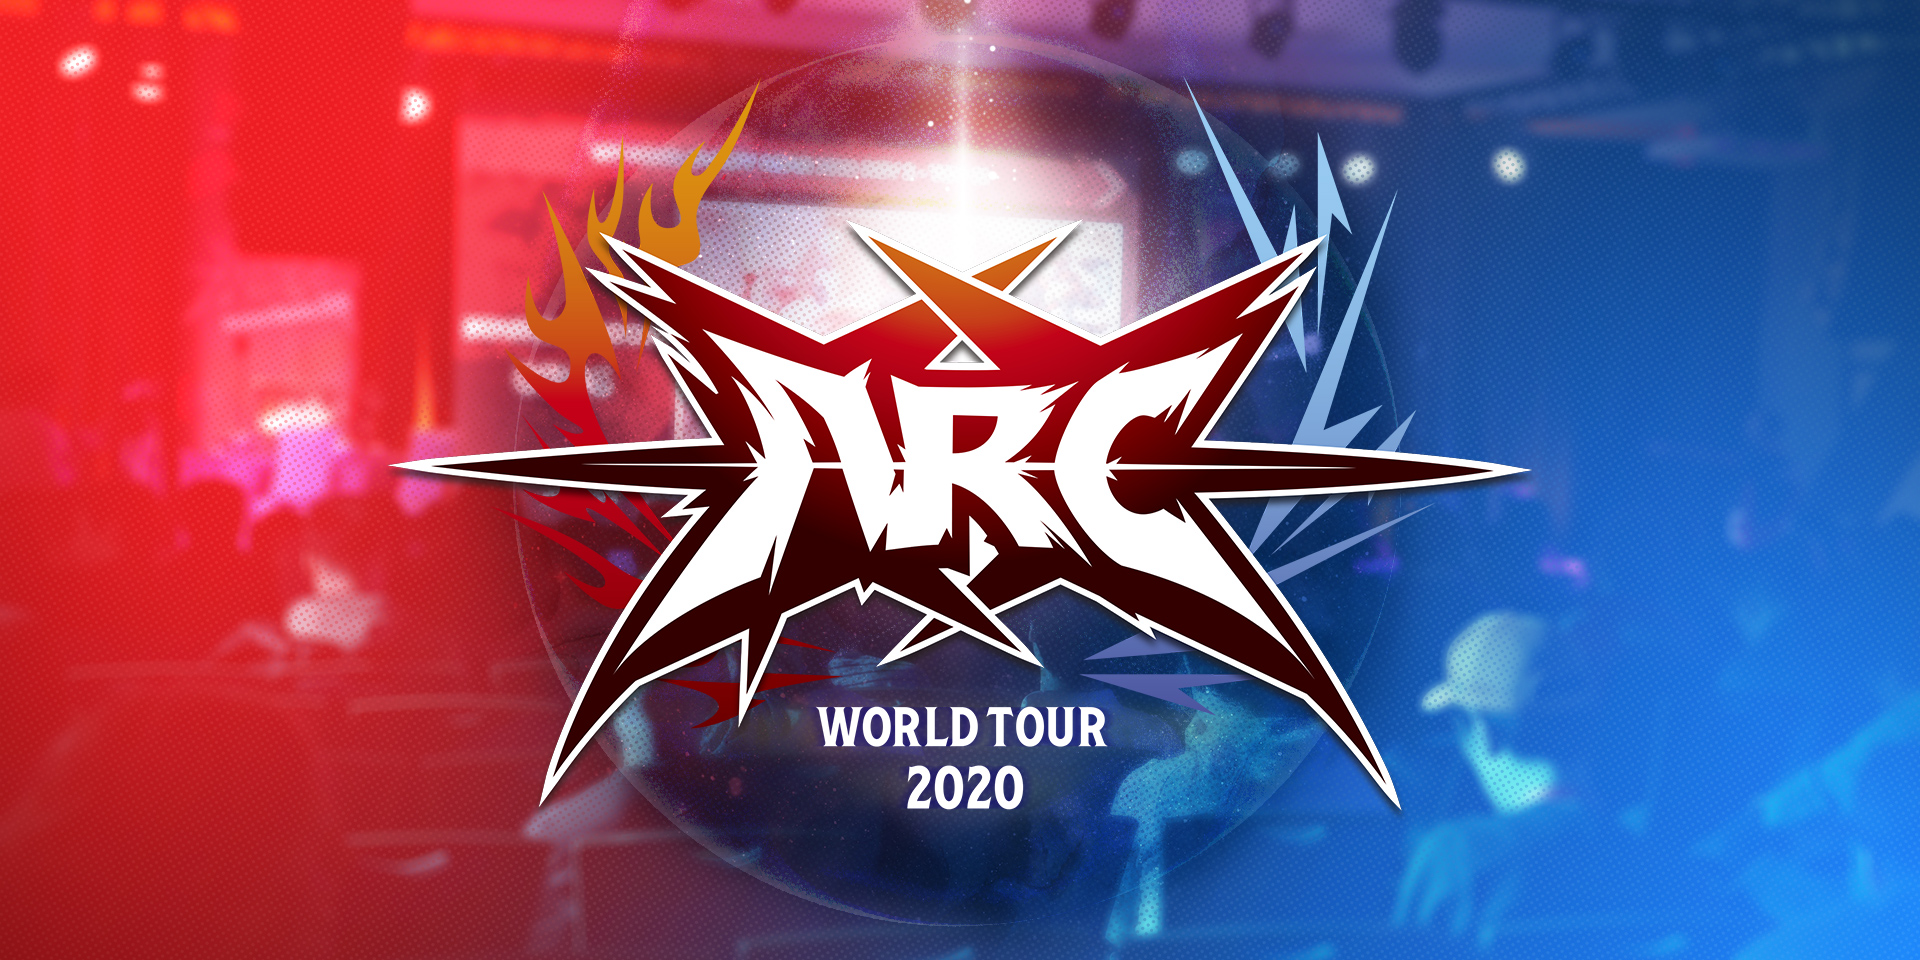 Arc World Tour 2020 đã bị hủy do sợ coronavirus 3